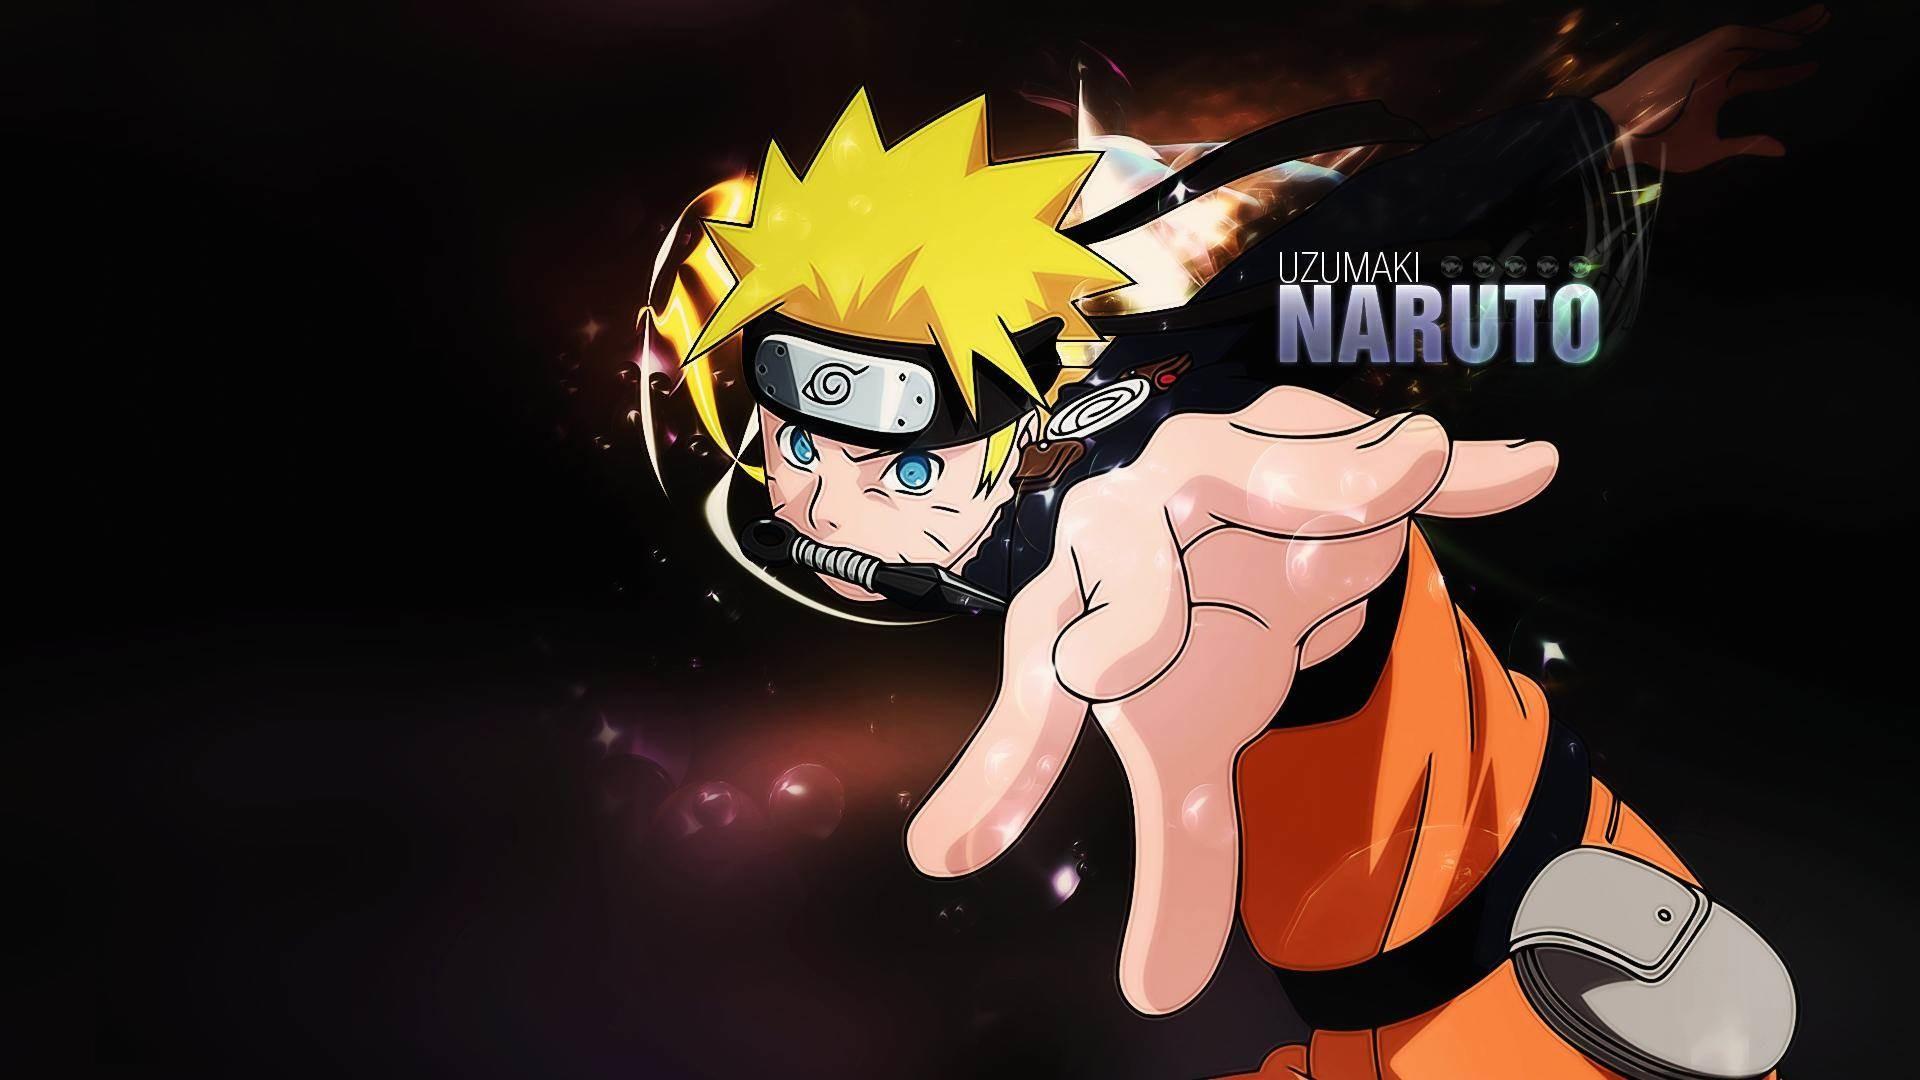 Most Inspiring Wallpaper Naruto Supreme - 1114773-naruto-neji-wallpaper-1920x1080-for-xiaomi  Image.jpg